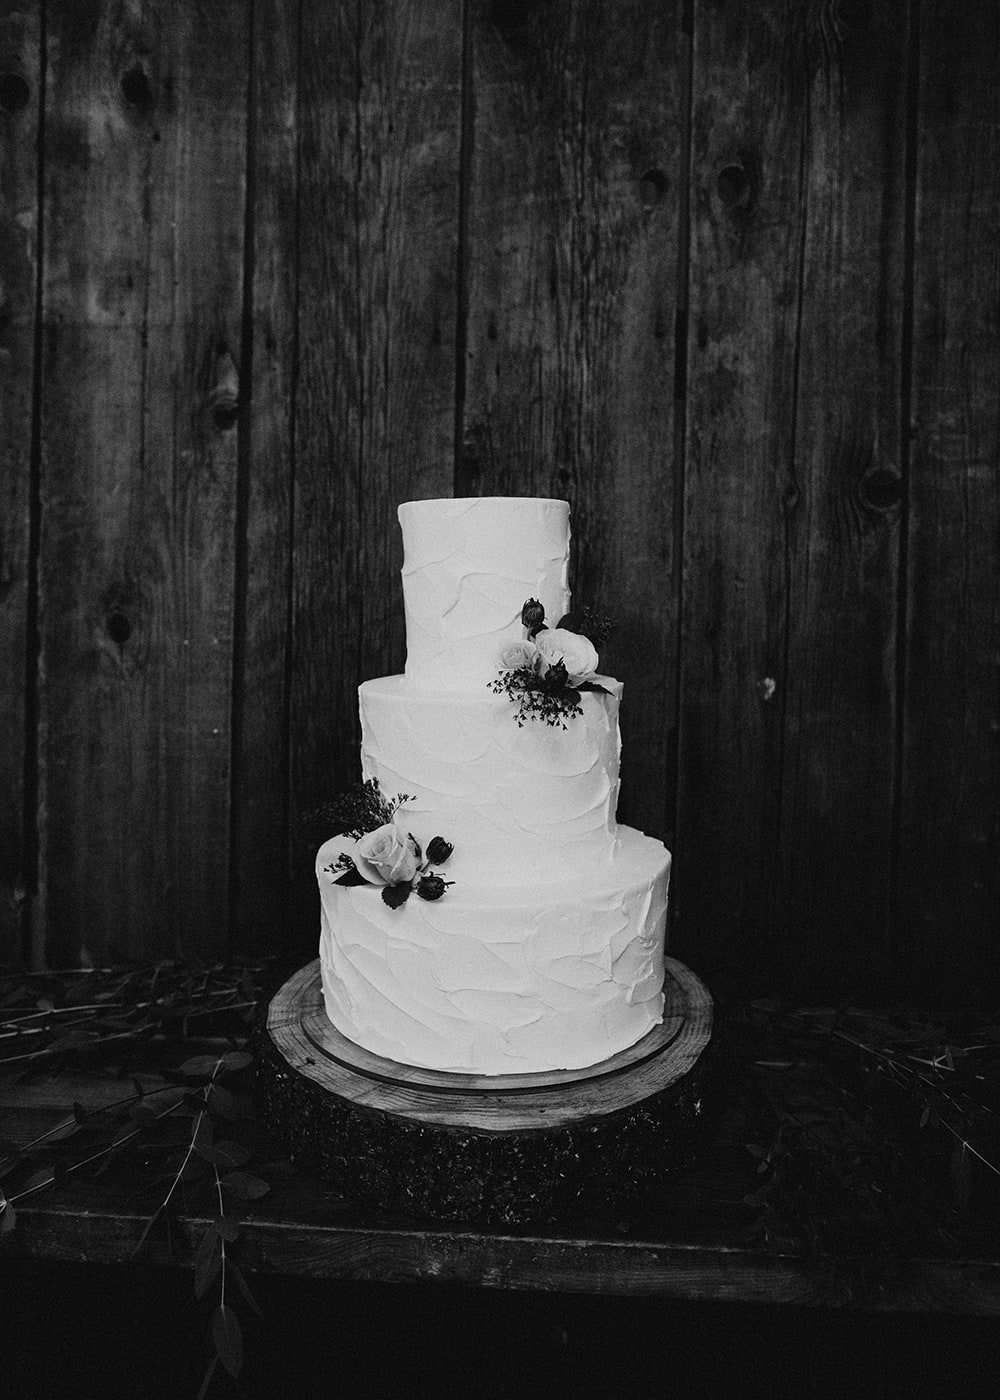 wedding cake setup in black and white